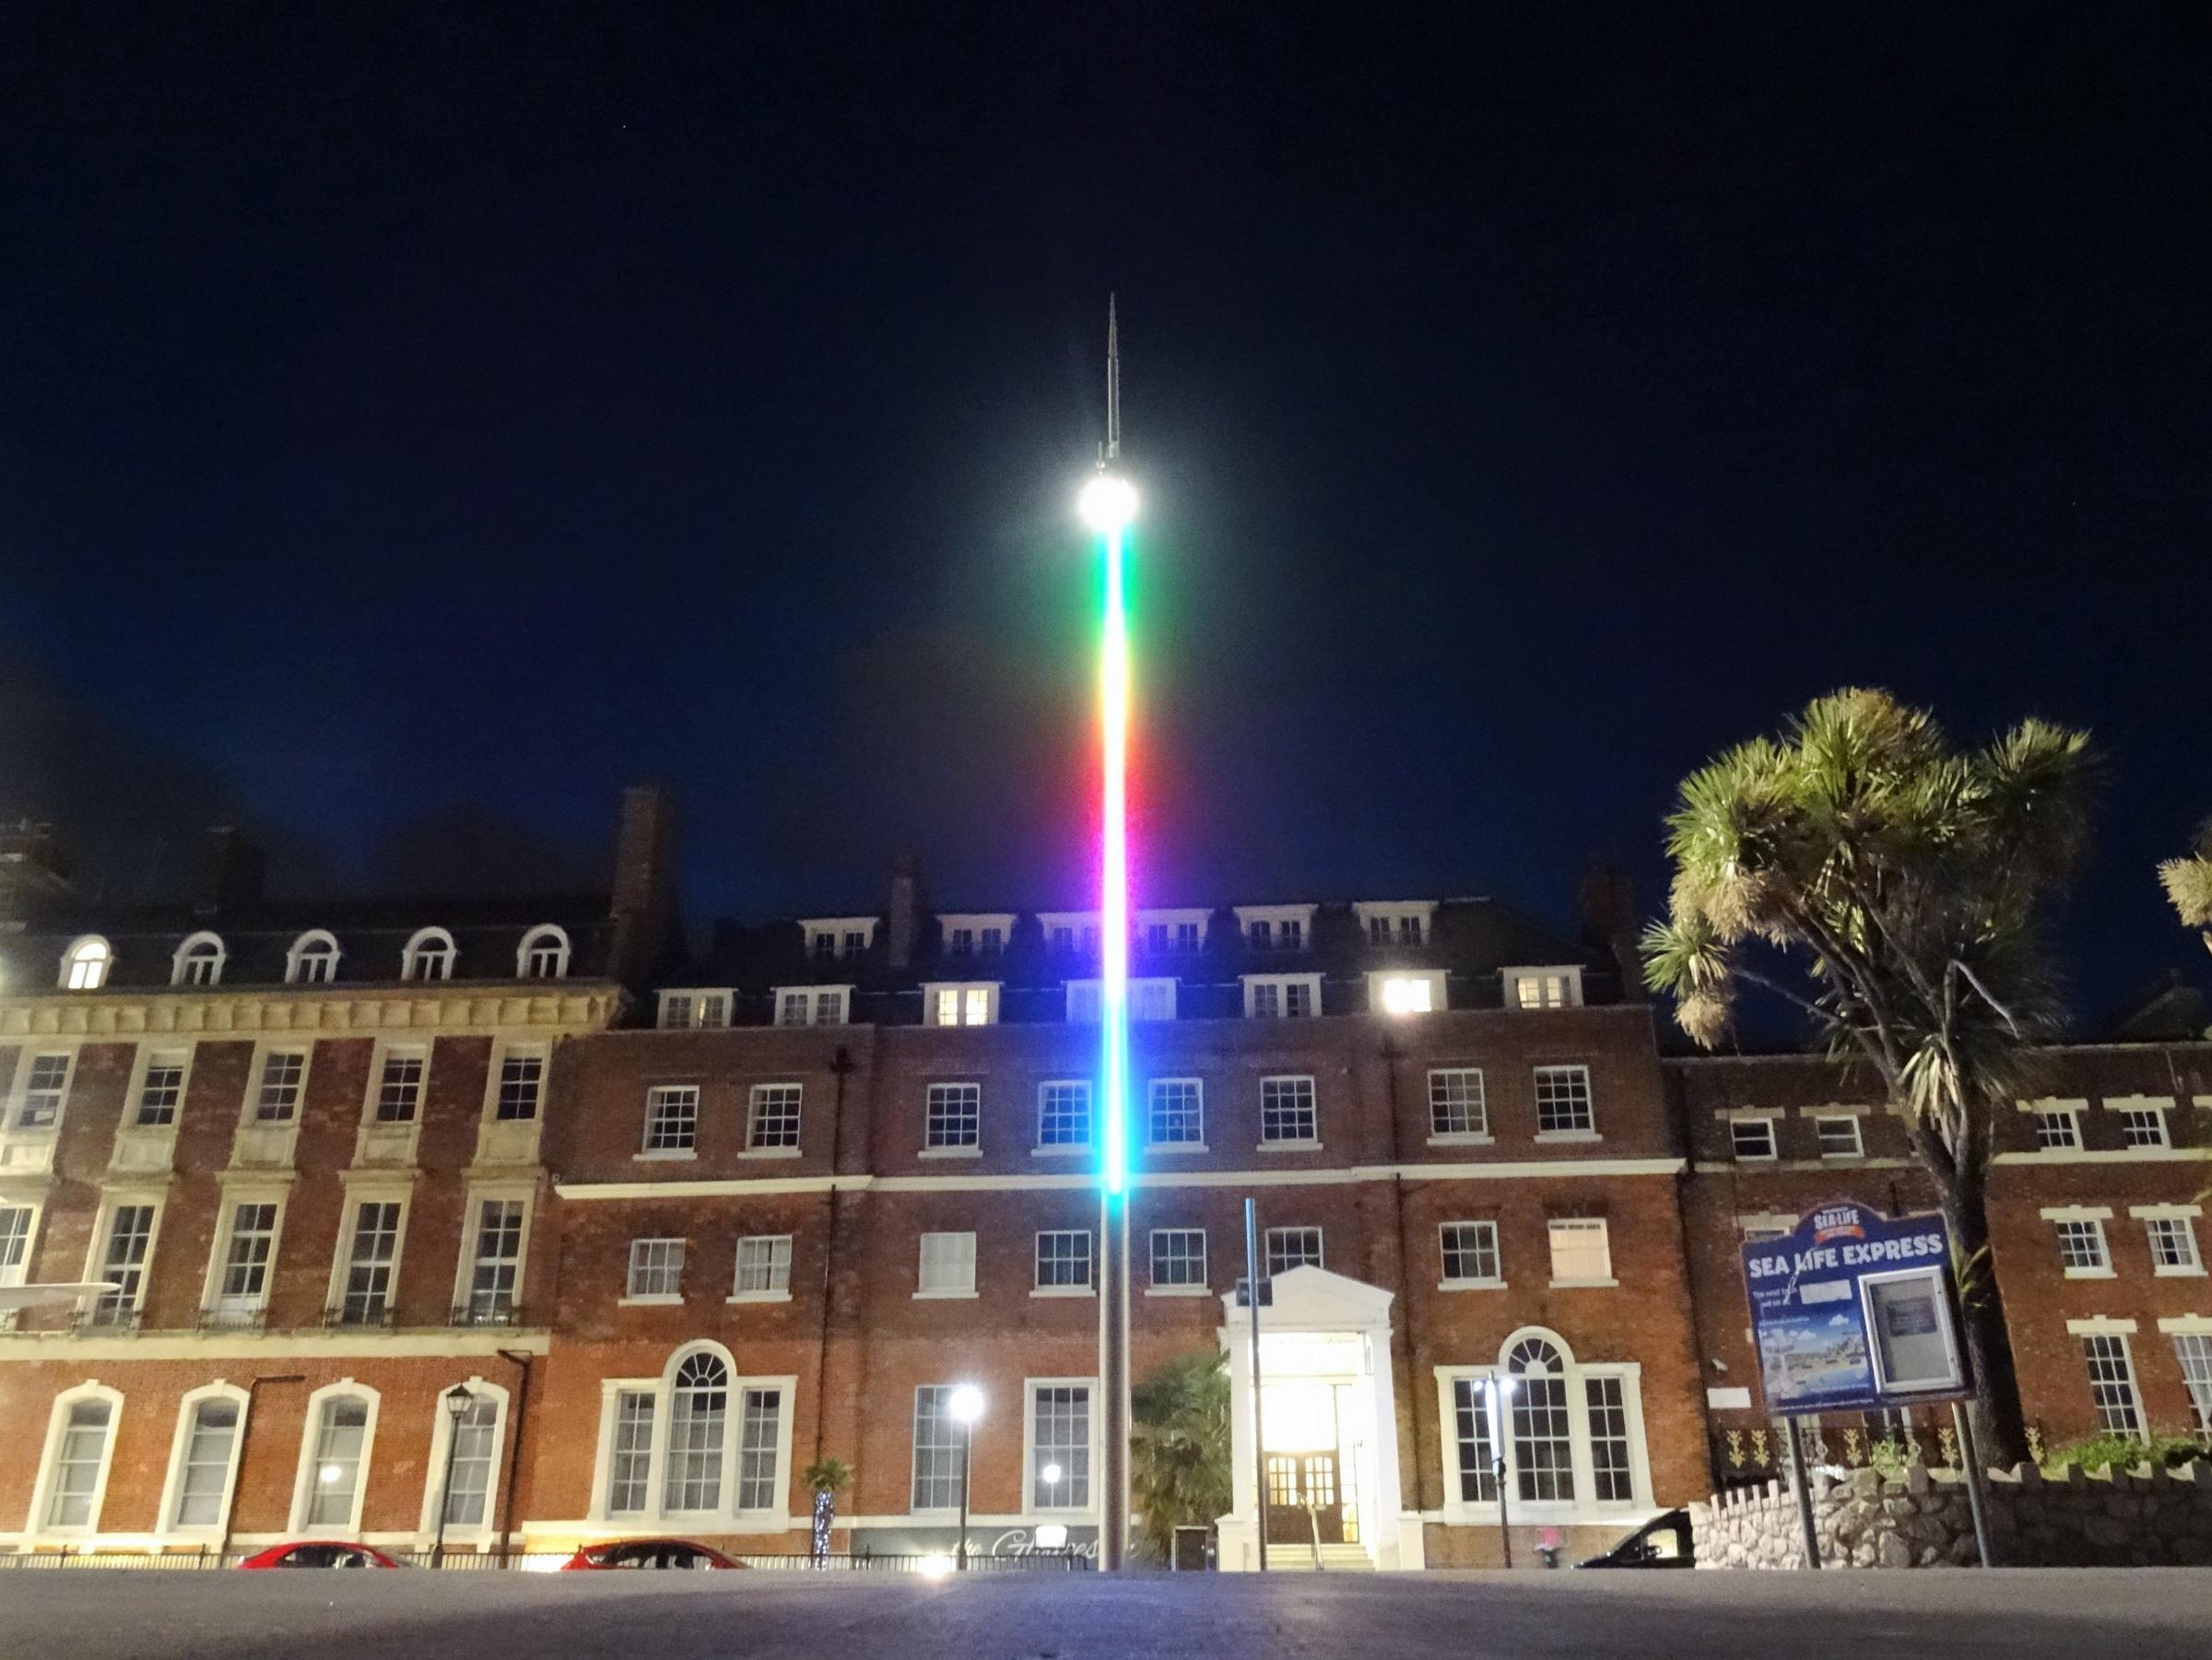 New Weymouth seafront lights spark debate - Dorset Echo